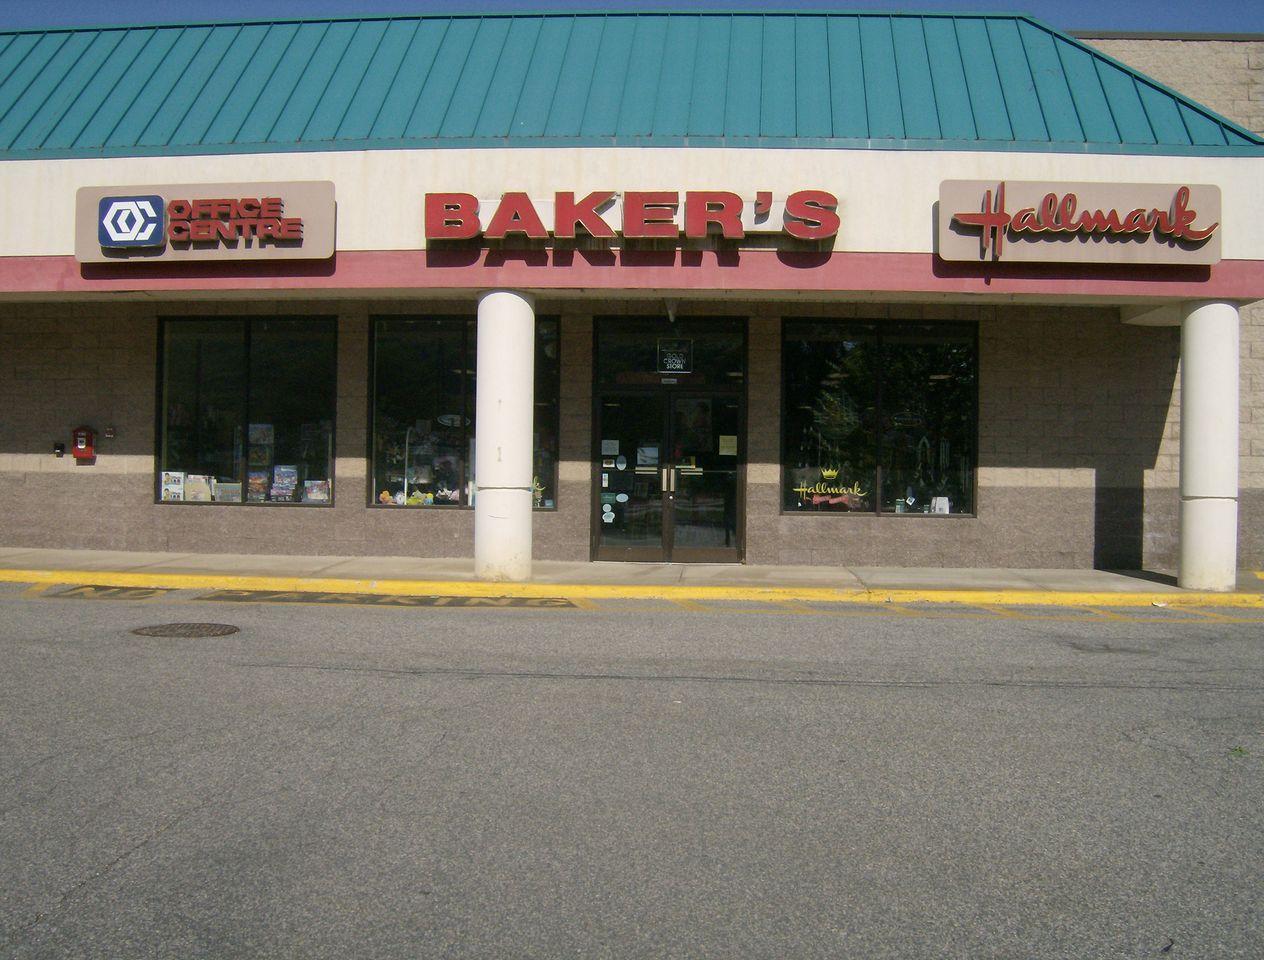 Baker's Hallmark